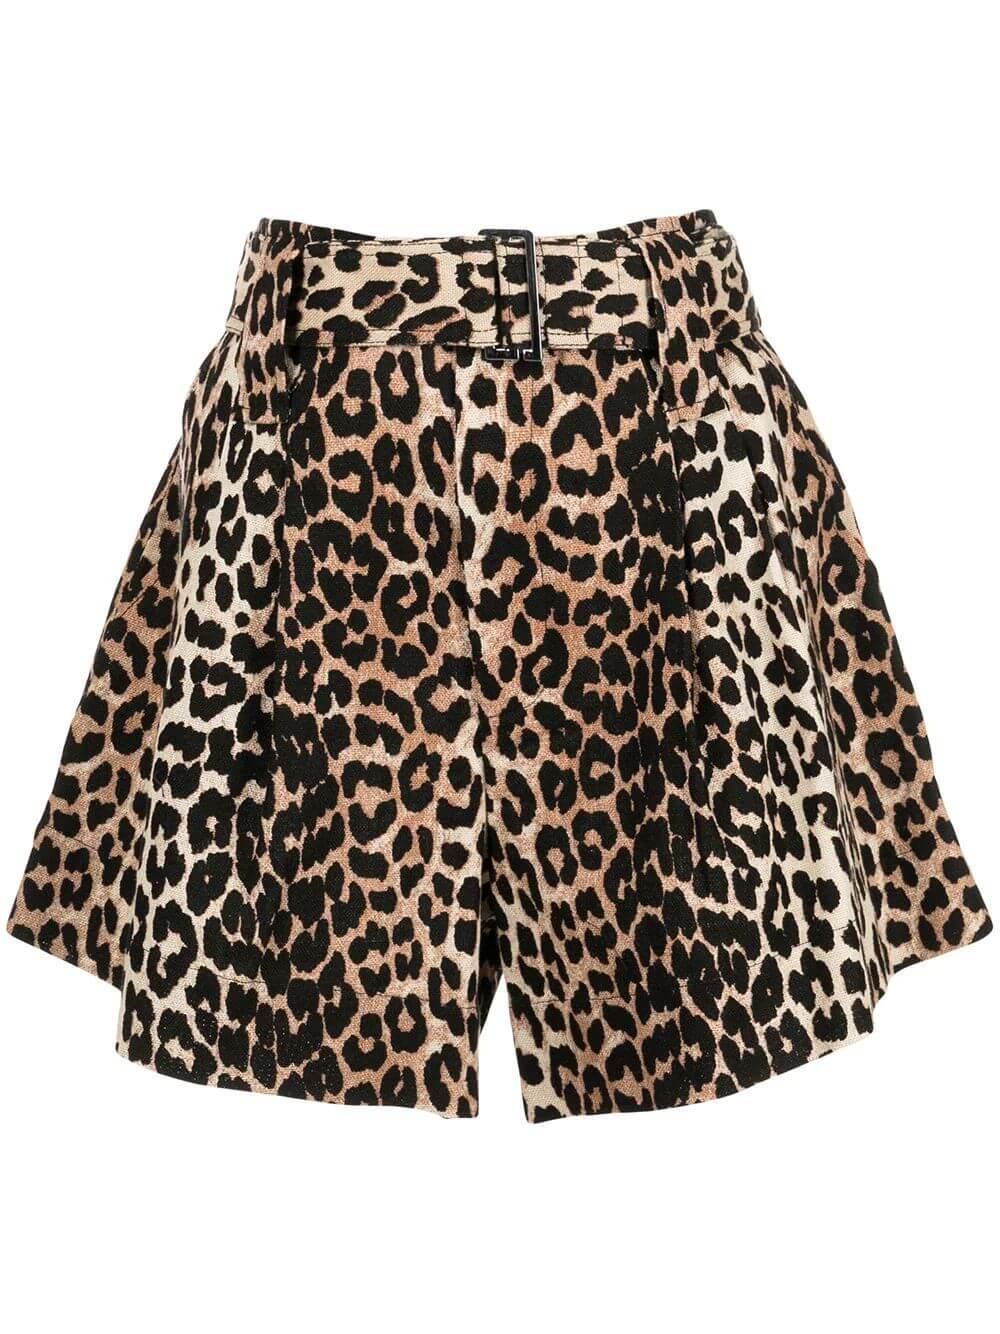 Linen Canvas Leopard Print Shorts